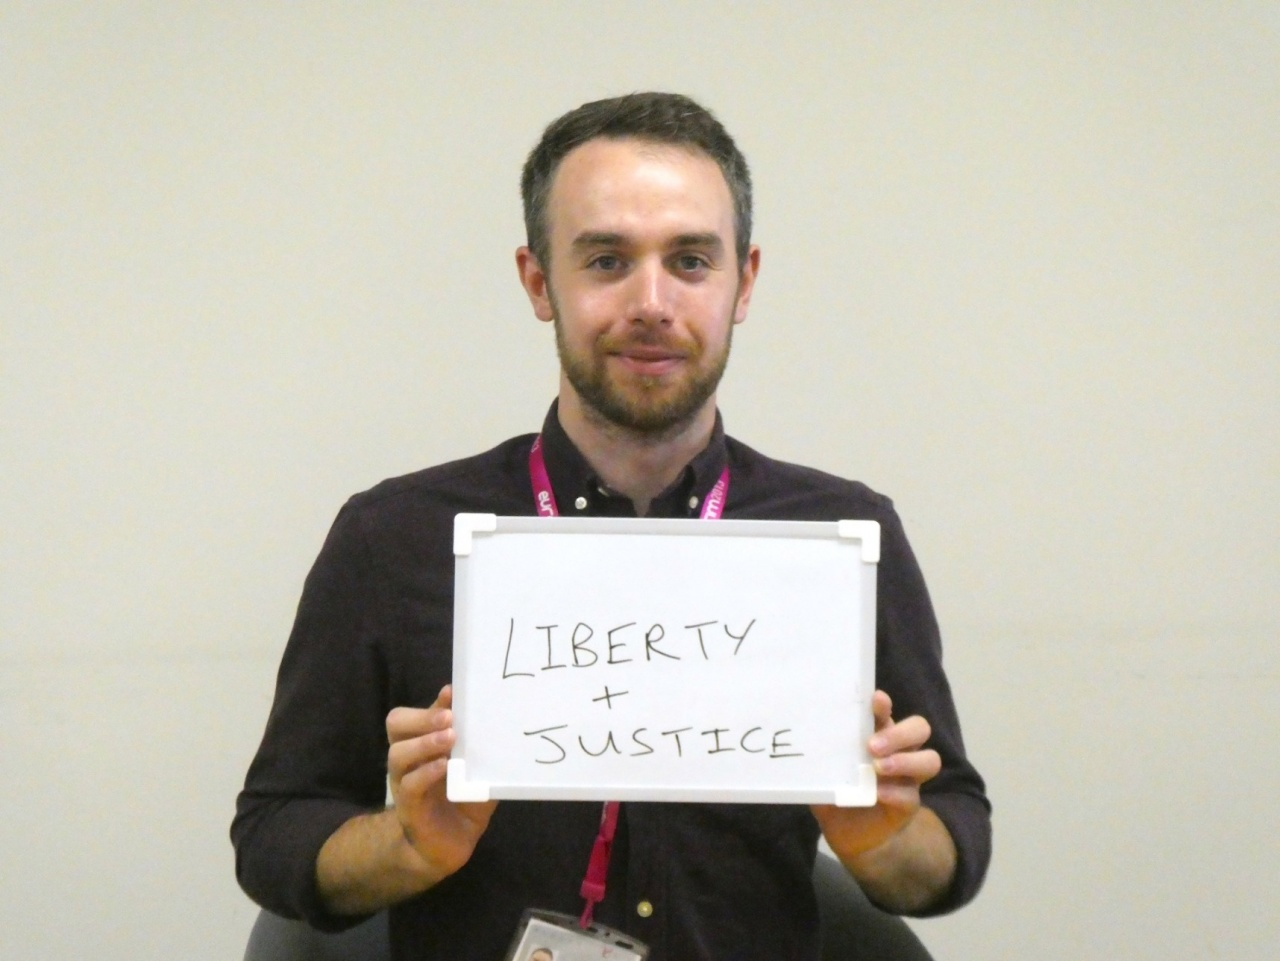 【LIBERTY + JUSTICE】